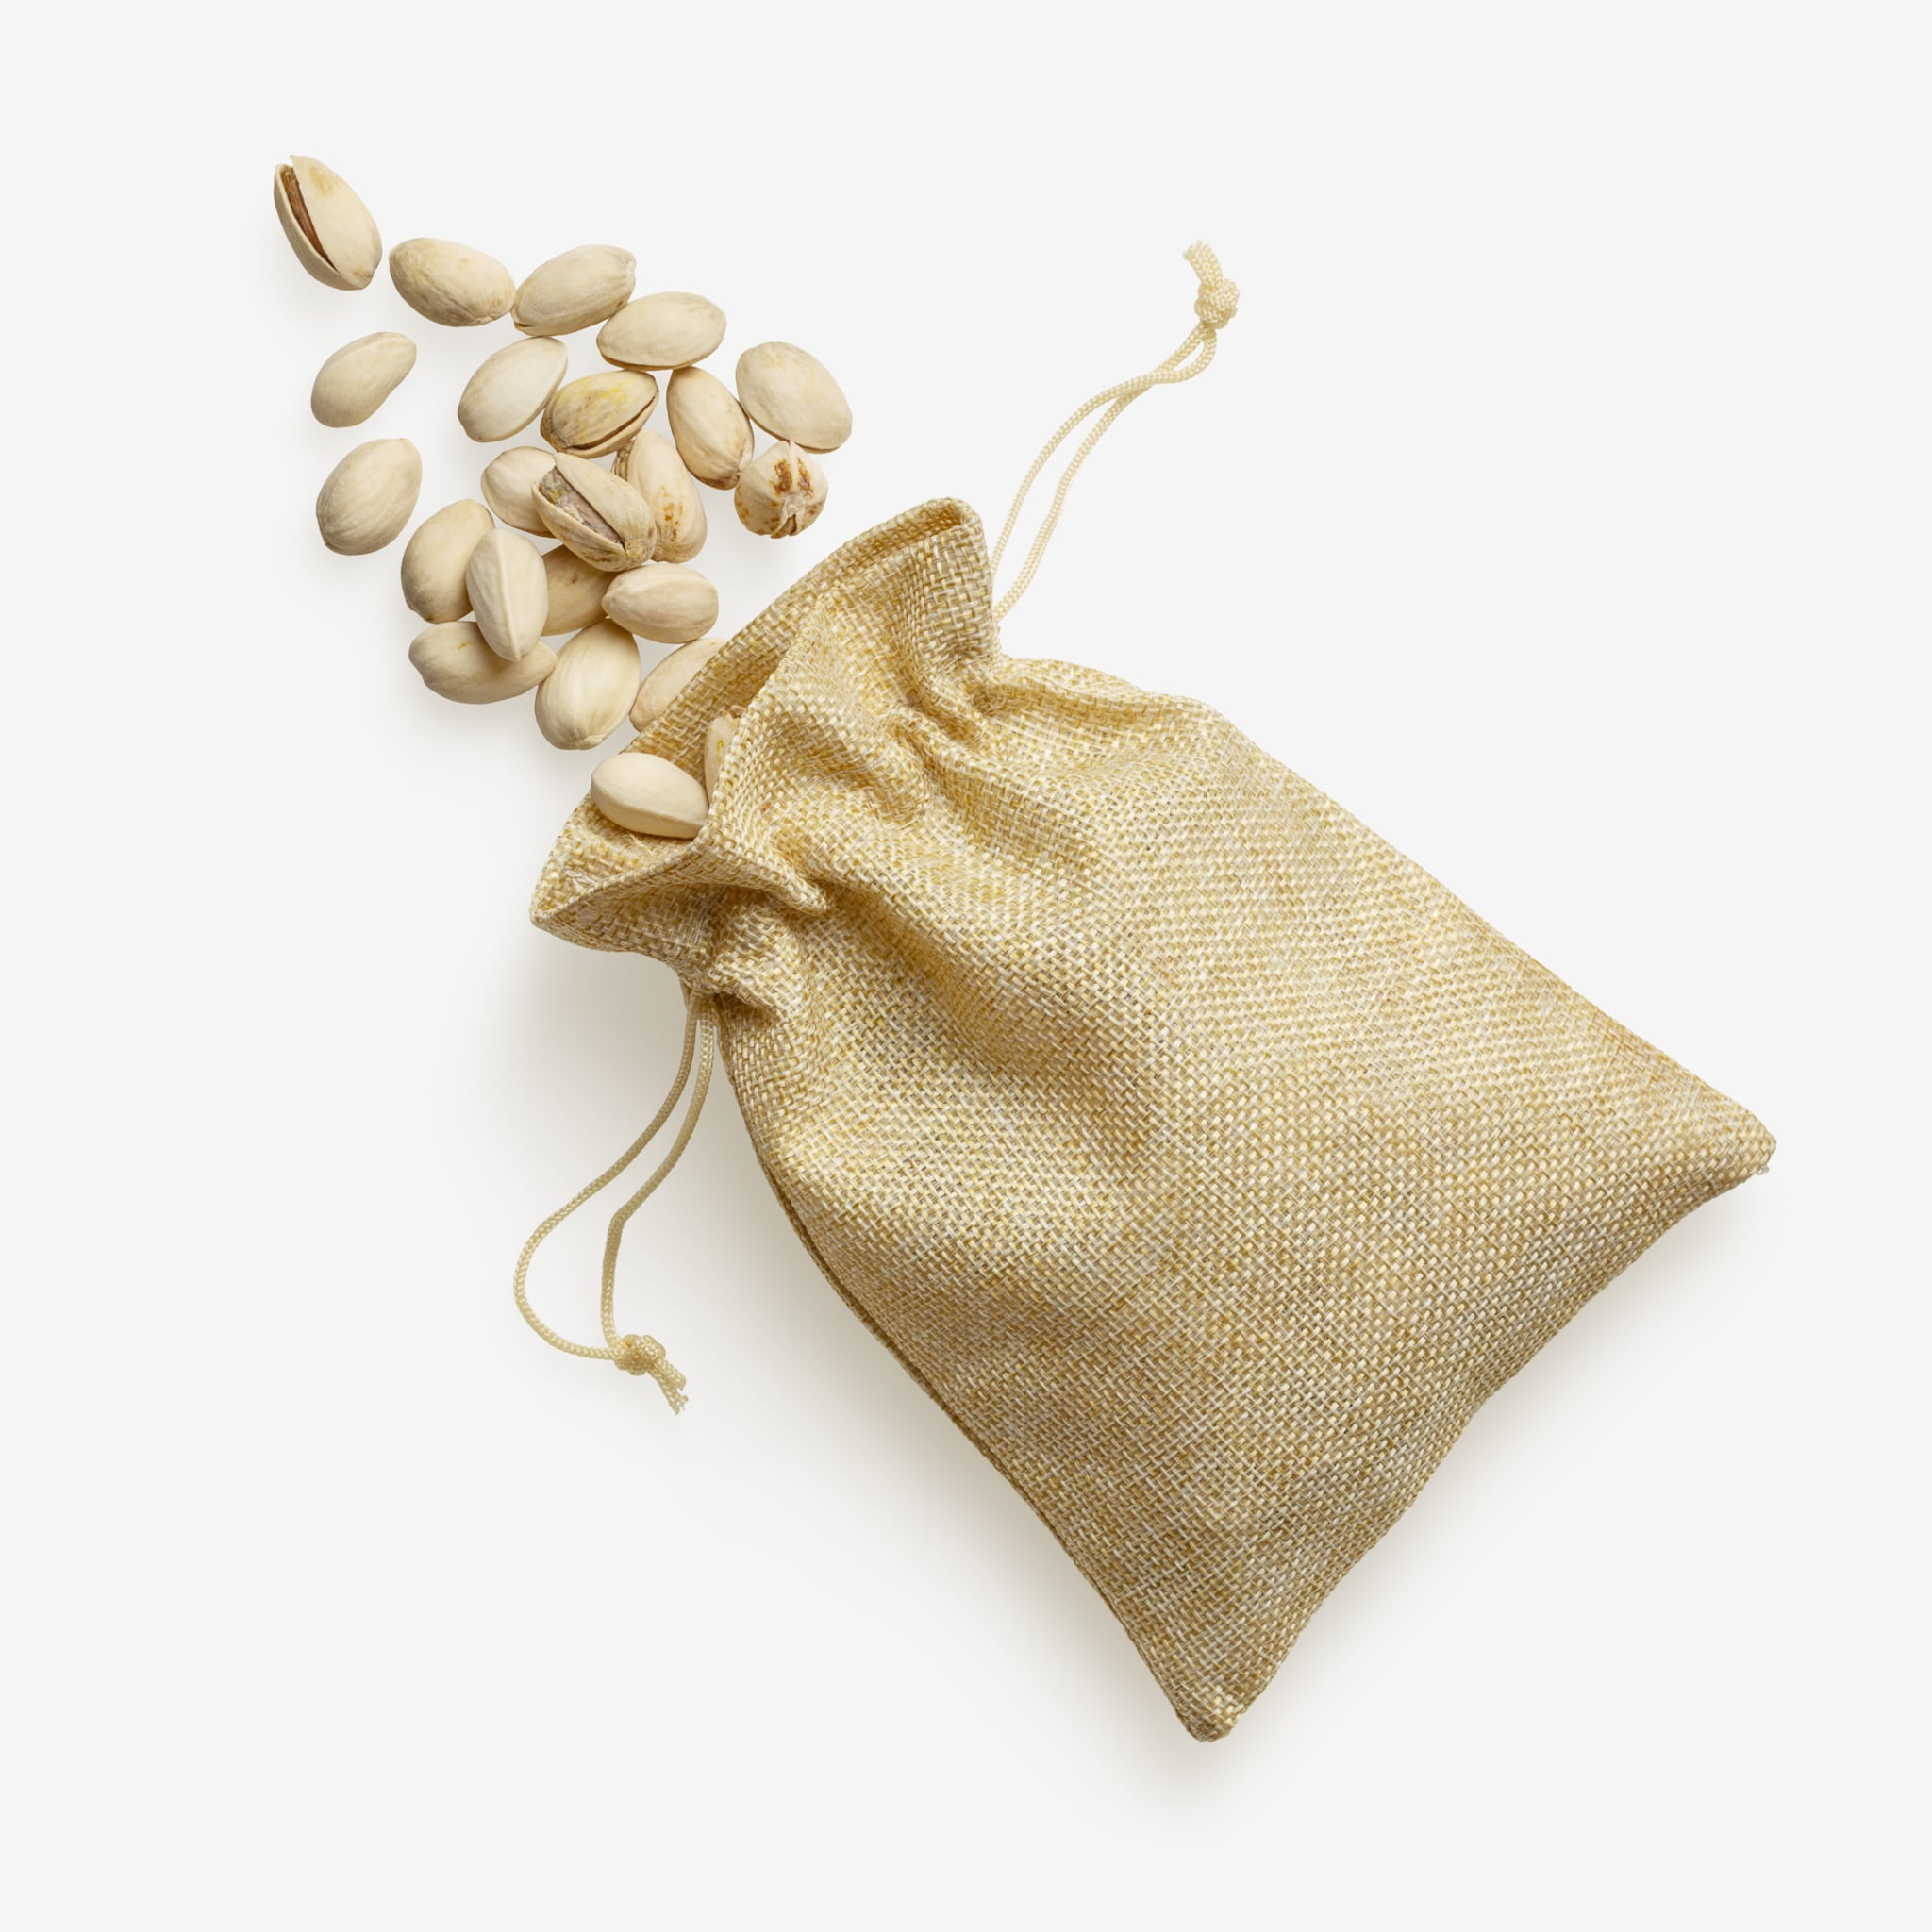 Bag of pistachios PSD image on transparent background